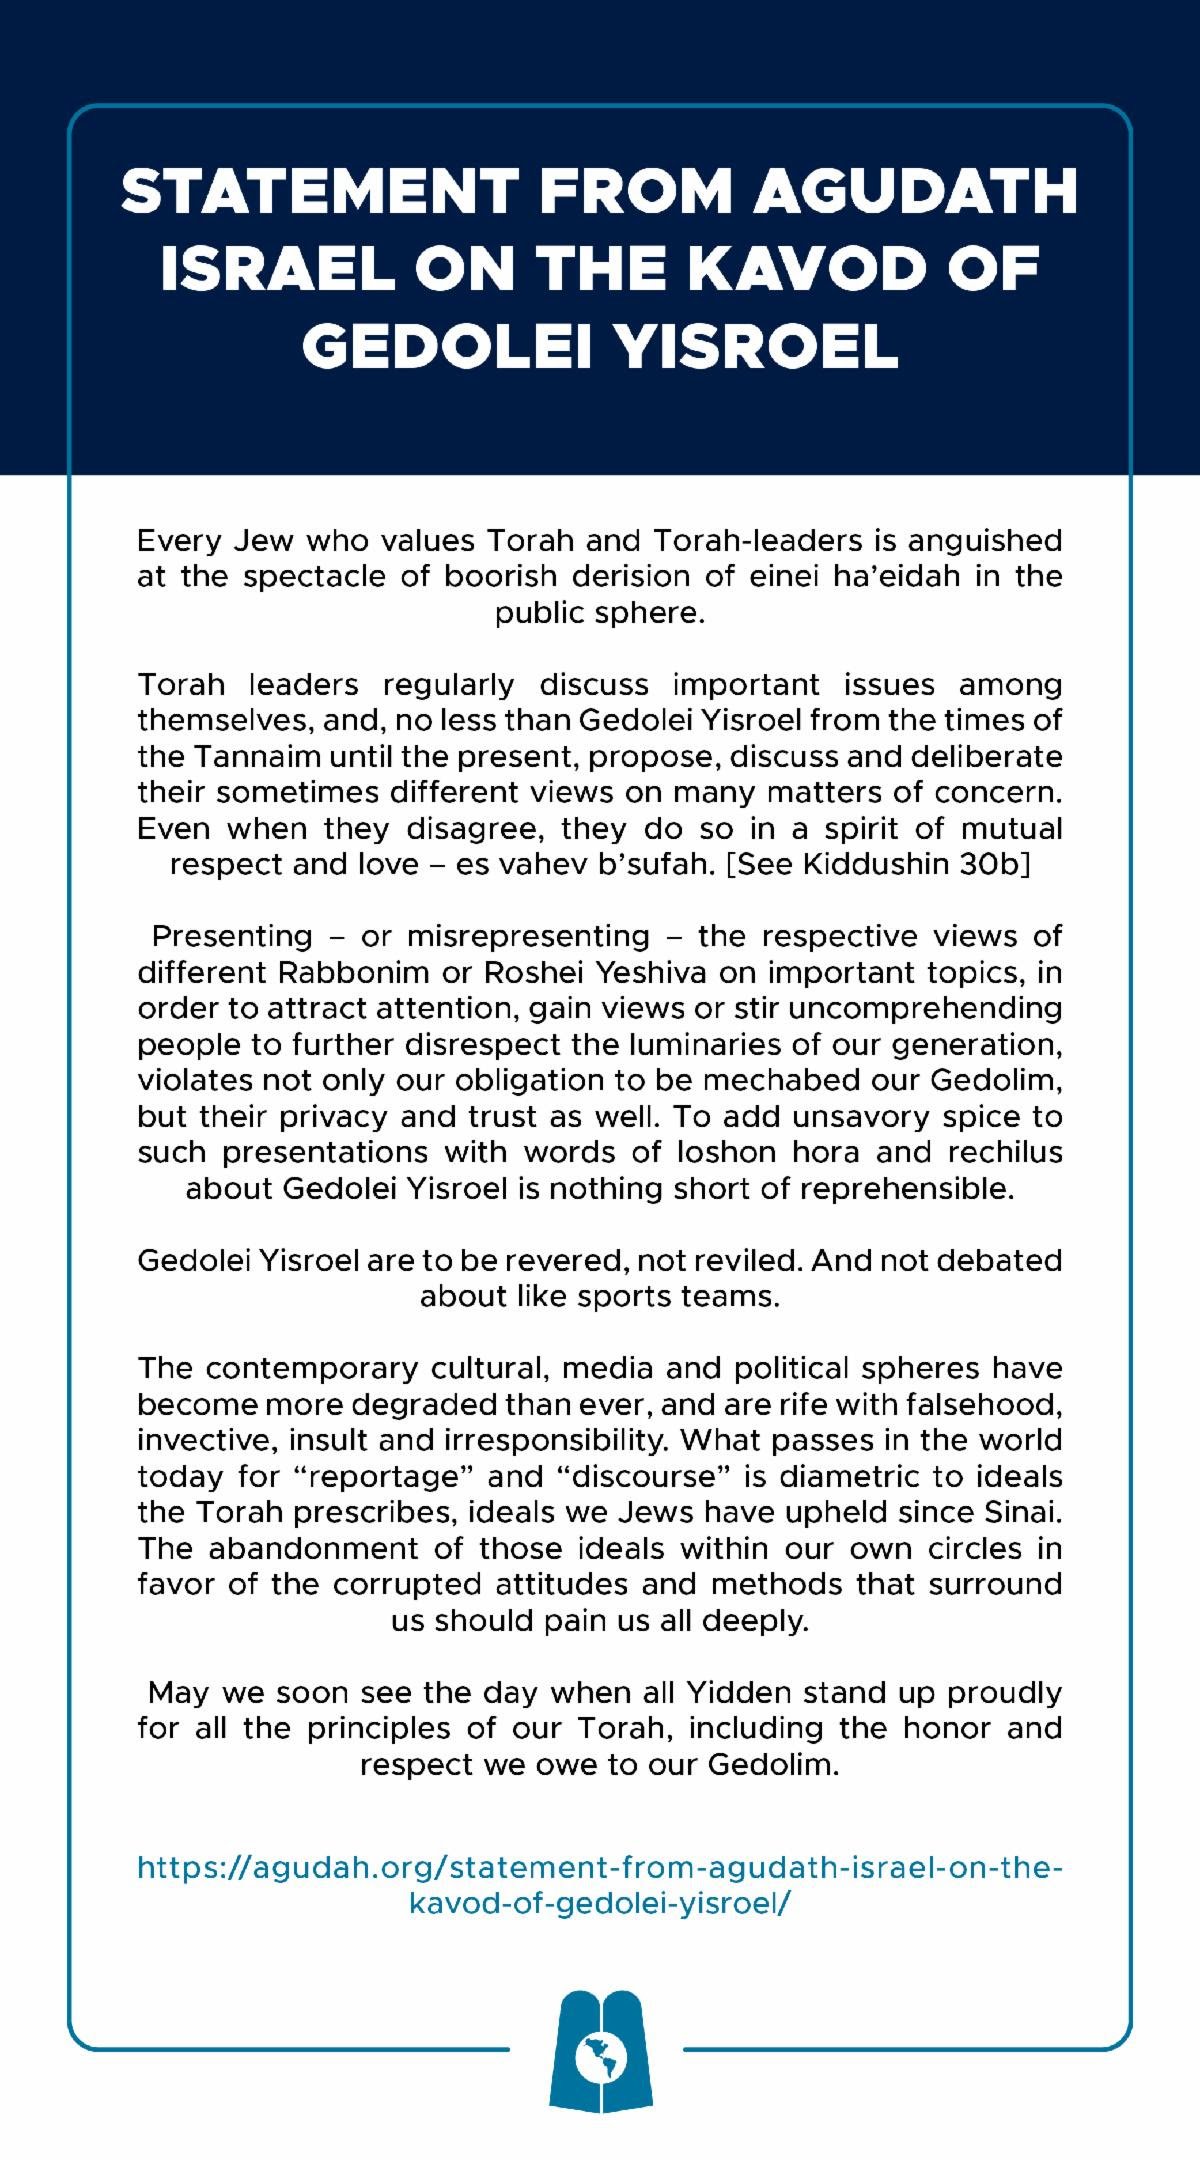 Statement from Agudath Israel on the Kavod of Gedolei Yisroel 2